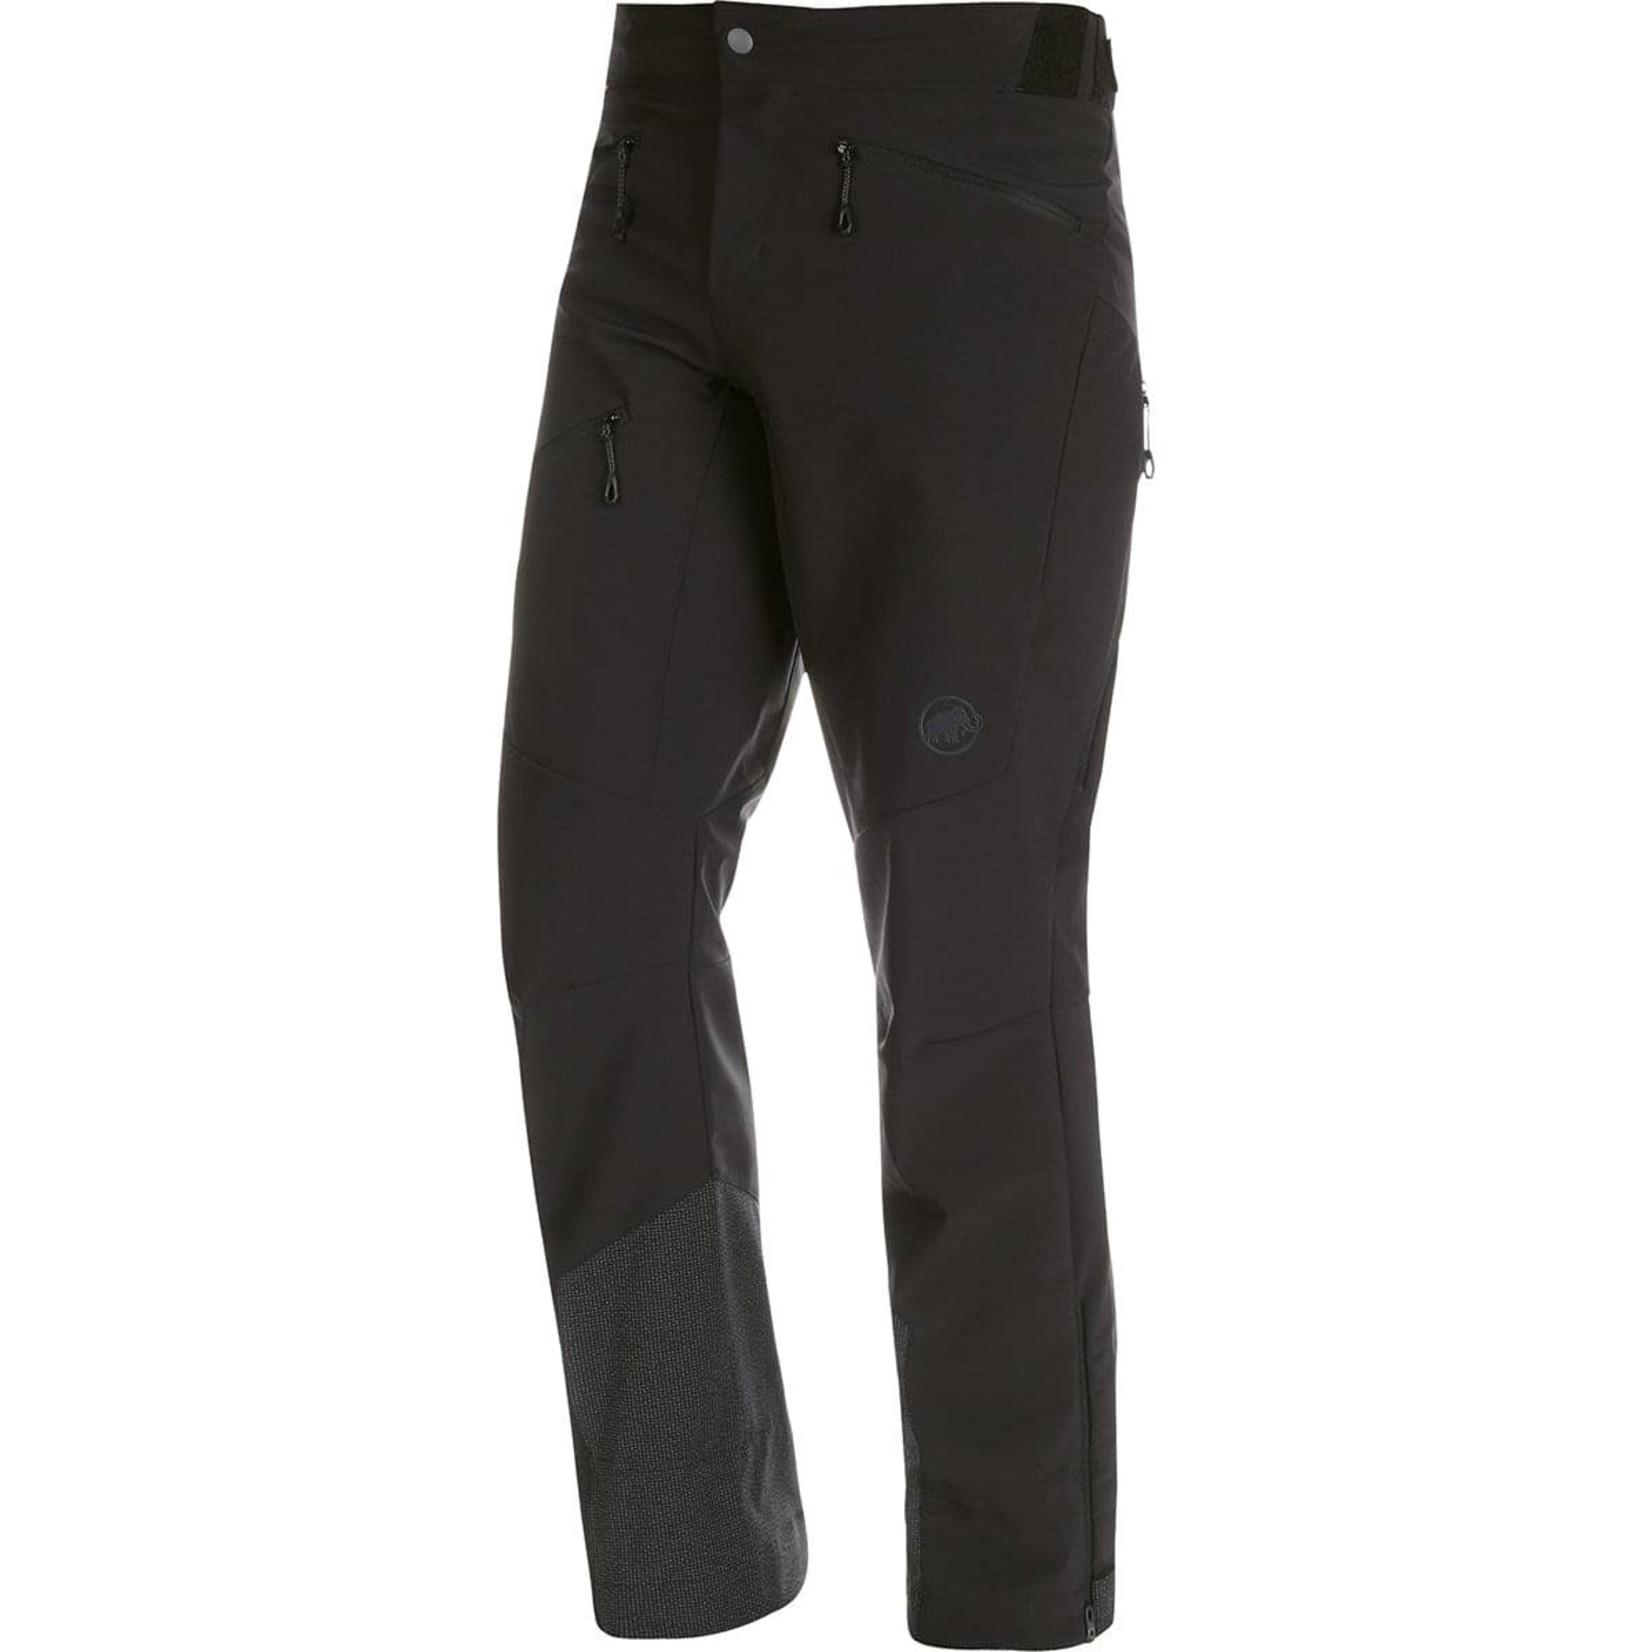 Mammut Pantalon Mammut Tatramar Softshell Pant - Homme